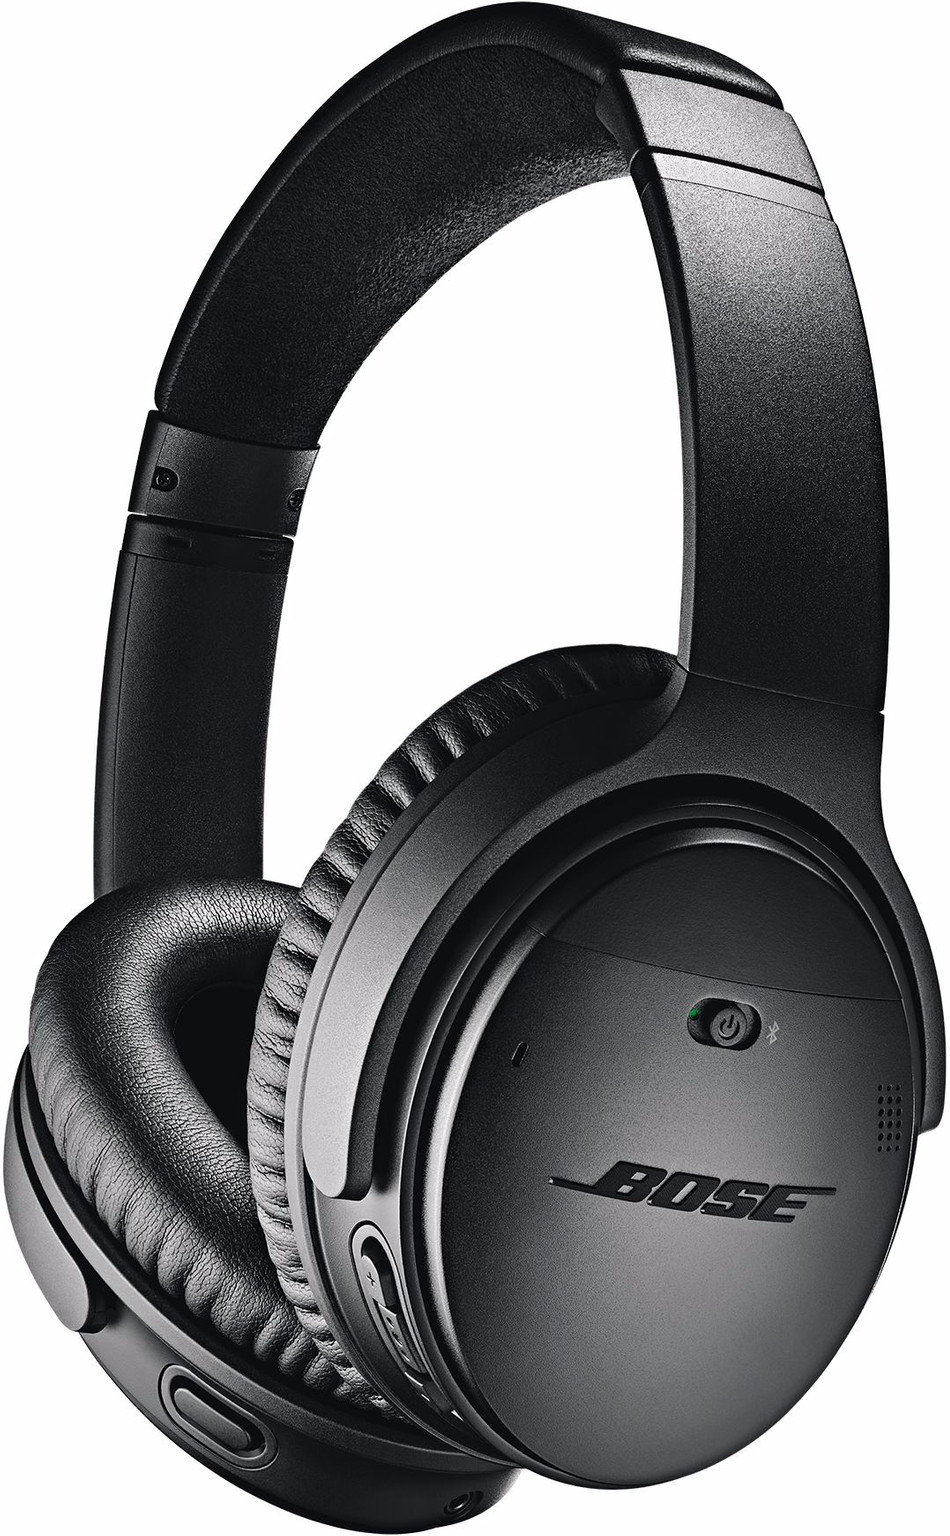 Bose QuietComfort 35 II noise cancelling